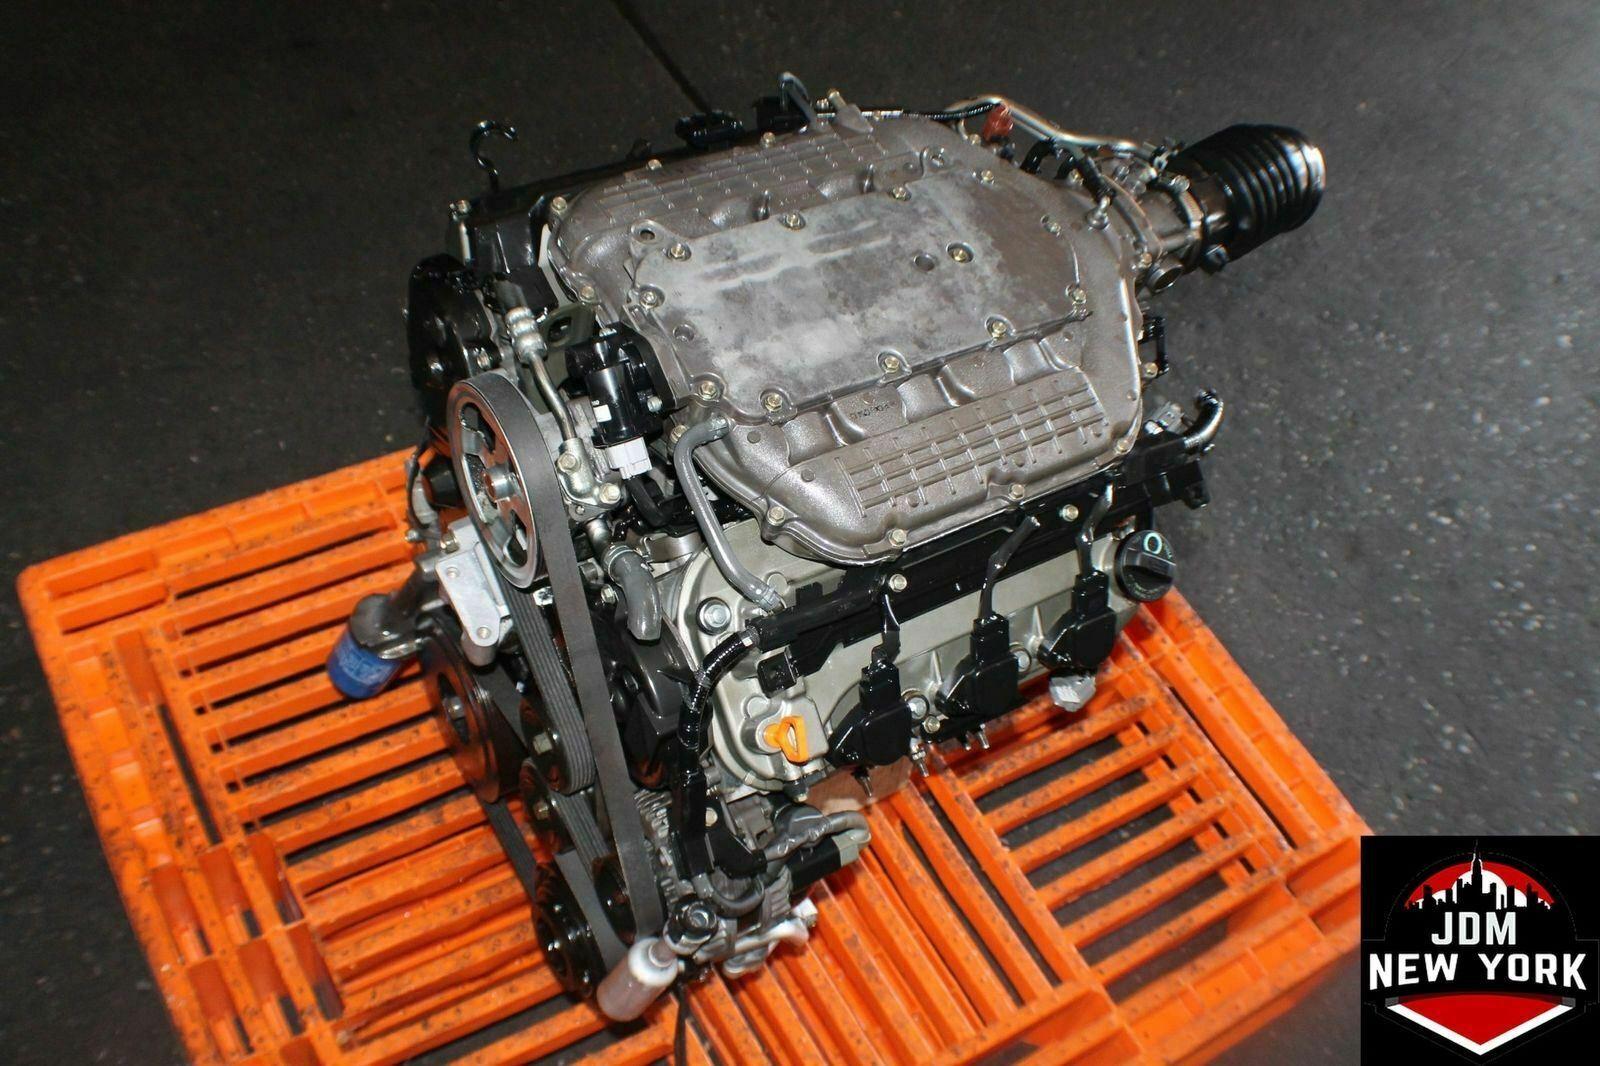 2007 2008 Acura Tl Type S 3 5l Sohc V6 Non Vcm Vtec Engine Jdm J35a Jdm New York